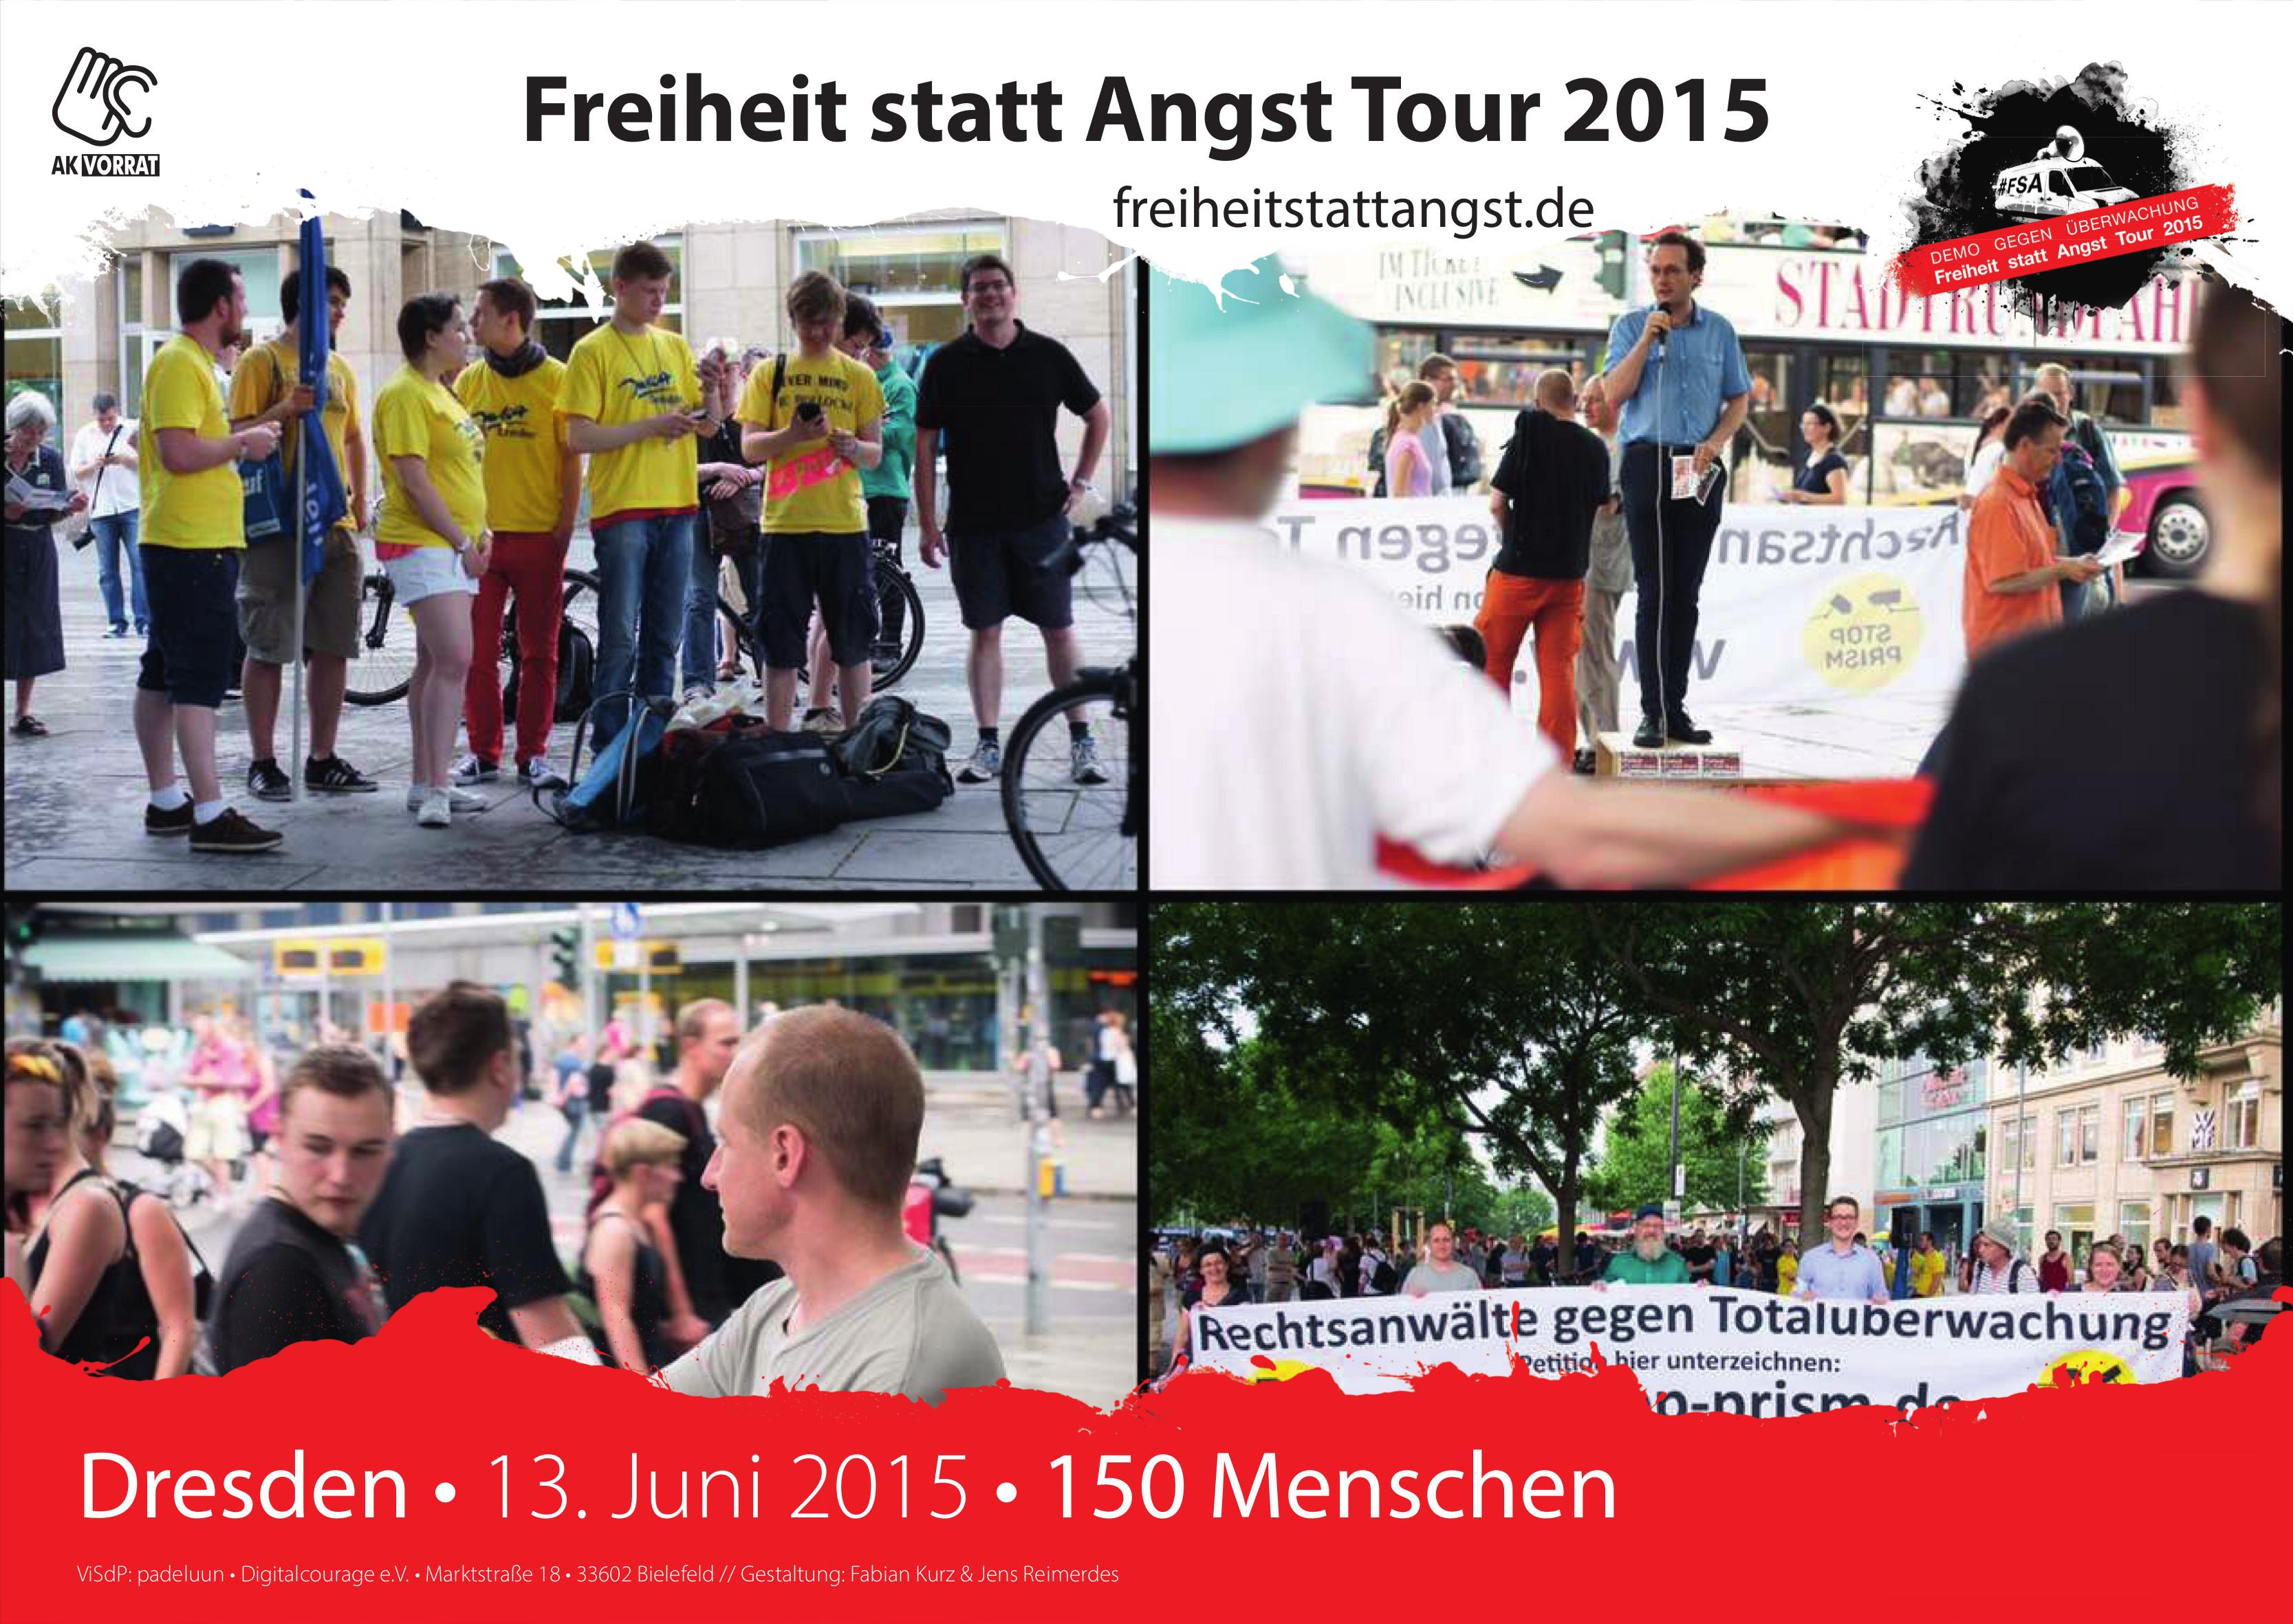 Der 13. Juni 2015 in Dresden.